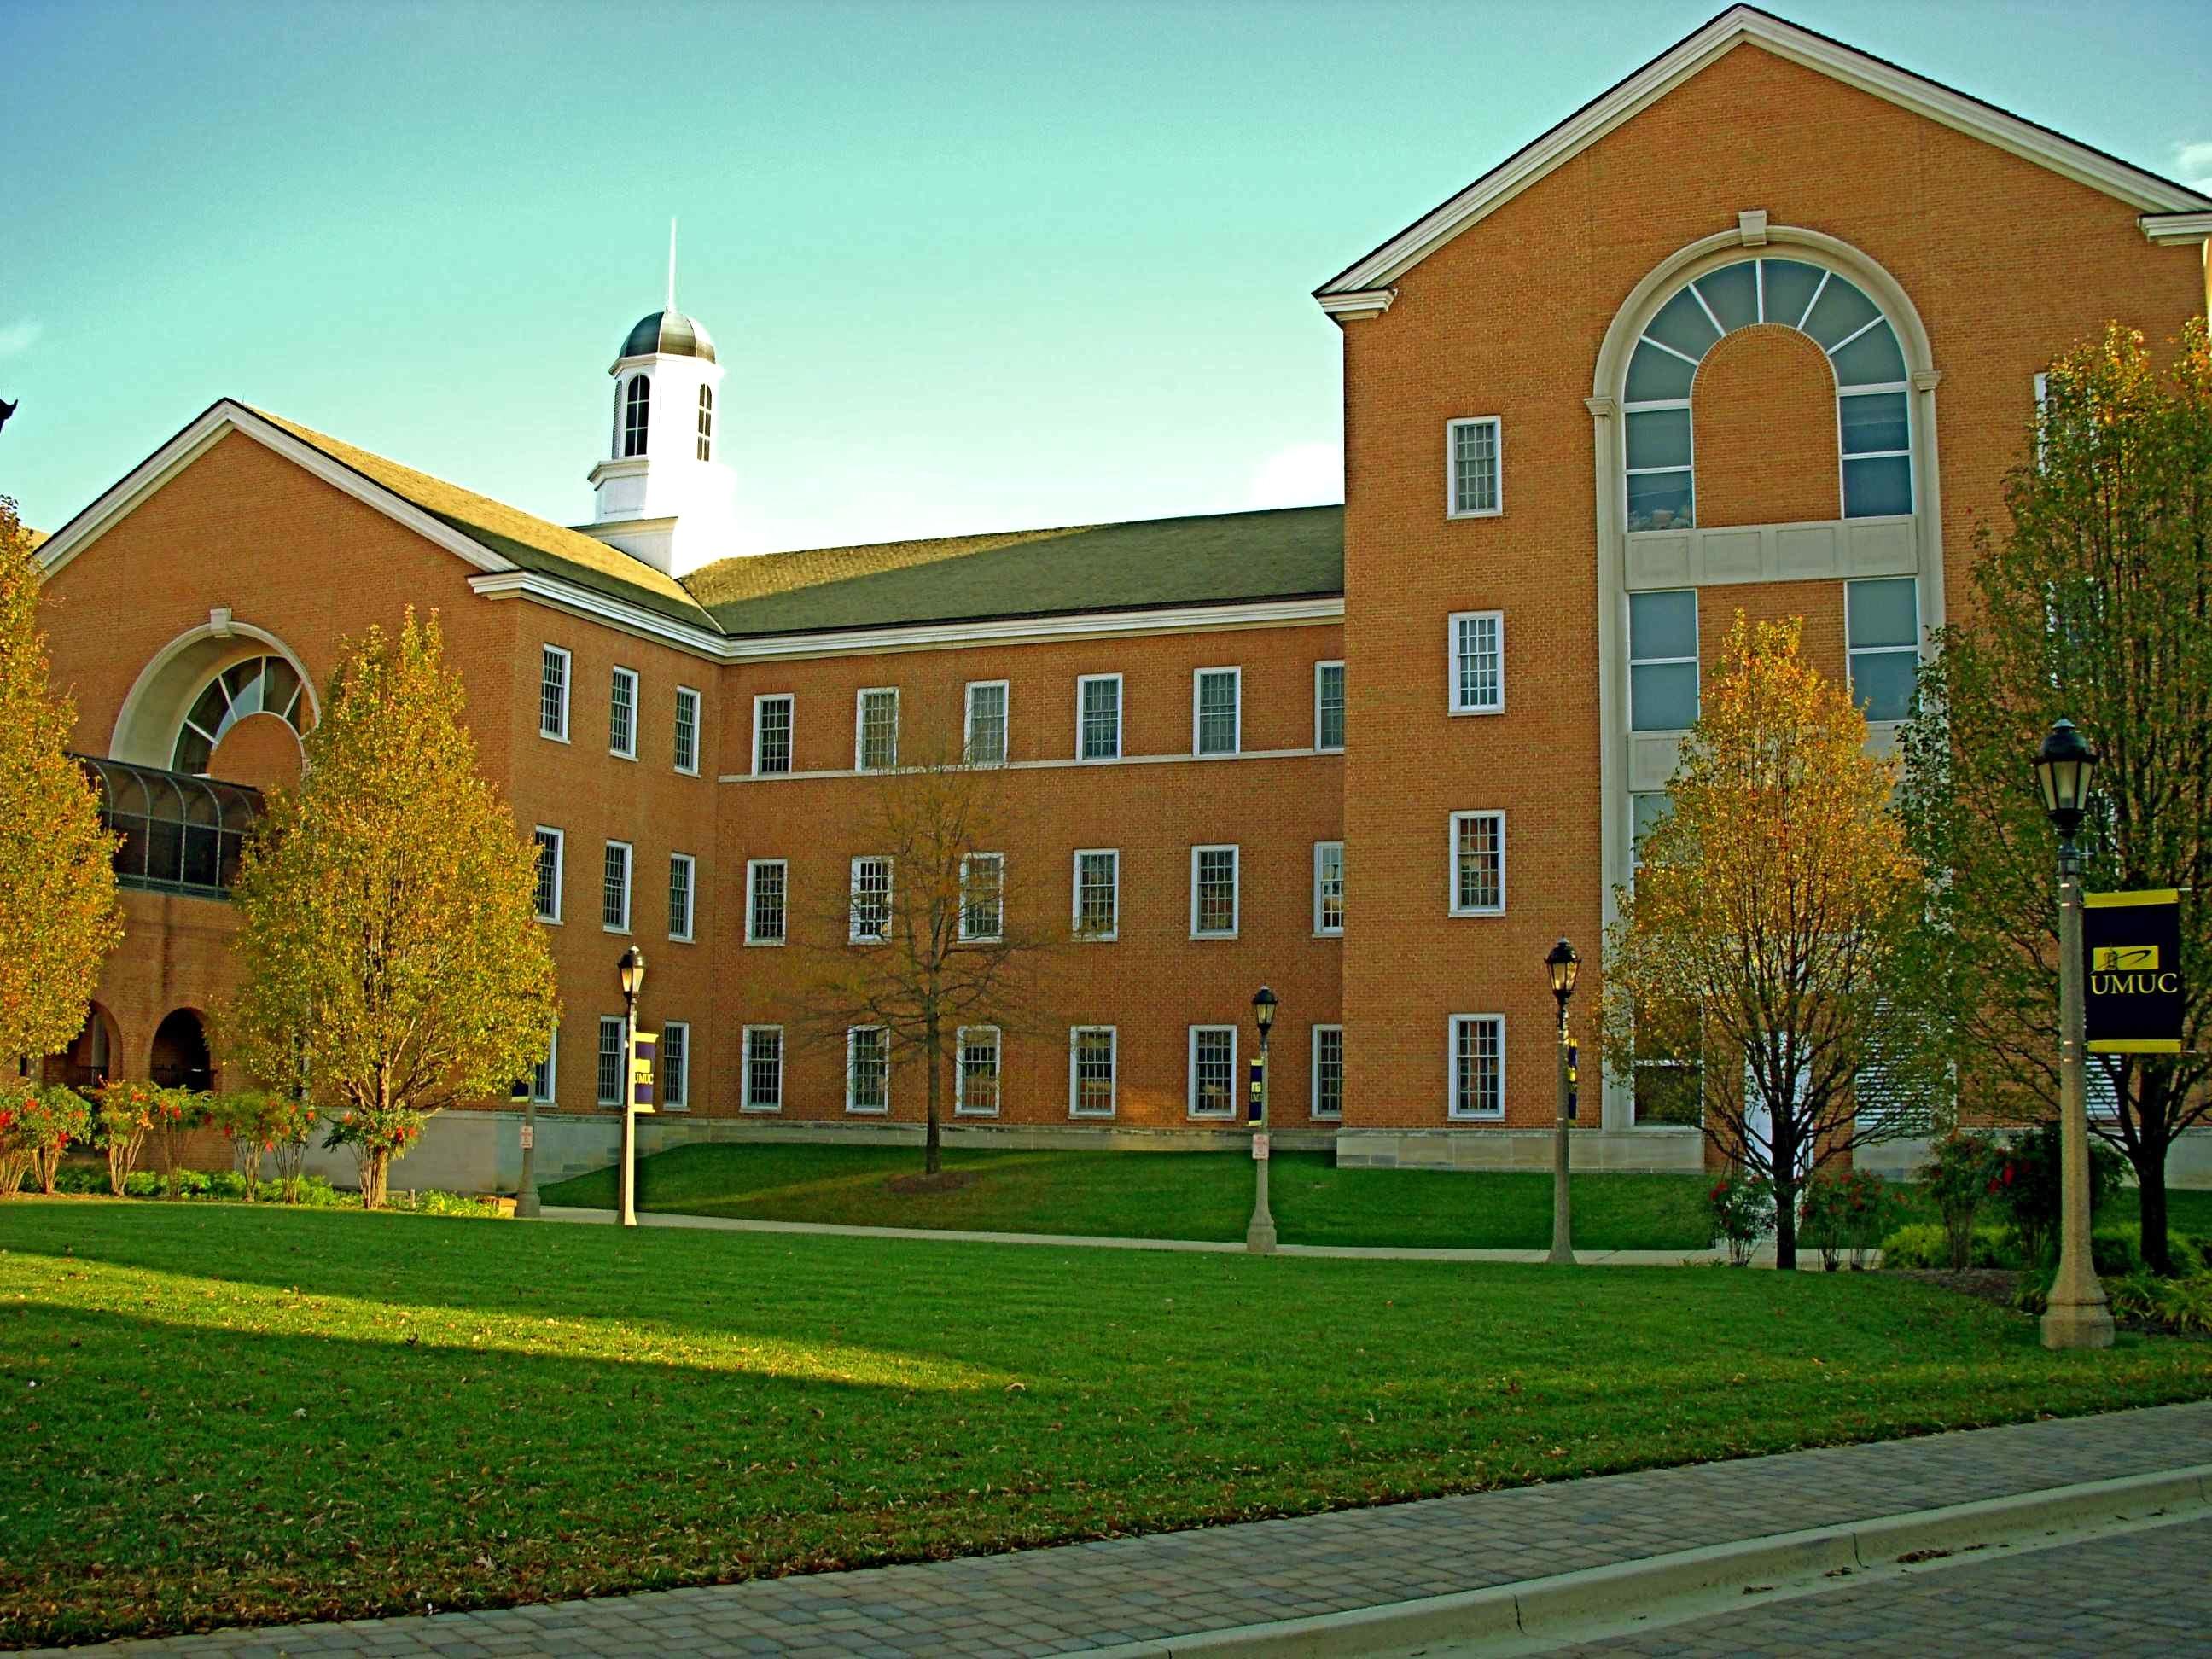 19. University Of Maryland At University College